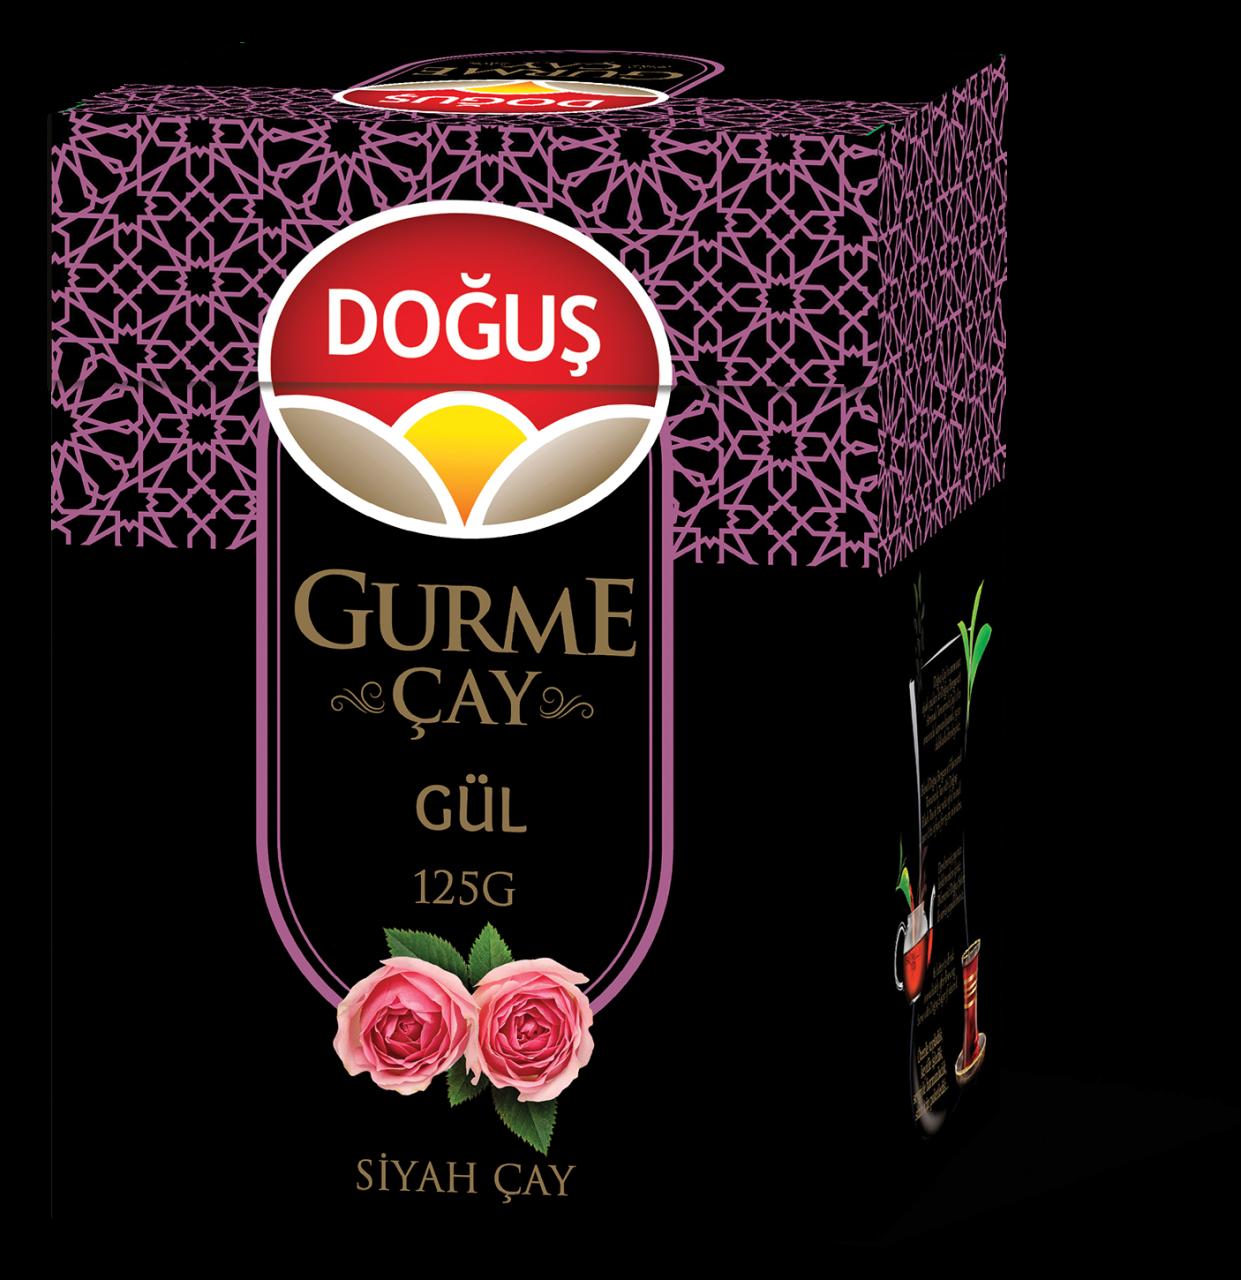 Turkey Native Nativity Gourmet Flavored Black Tea 125g Rose Flavored Teapots     - title=